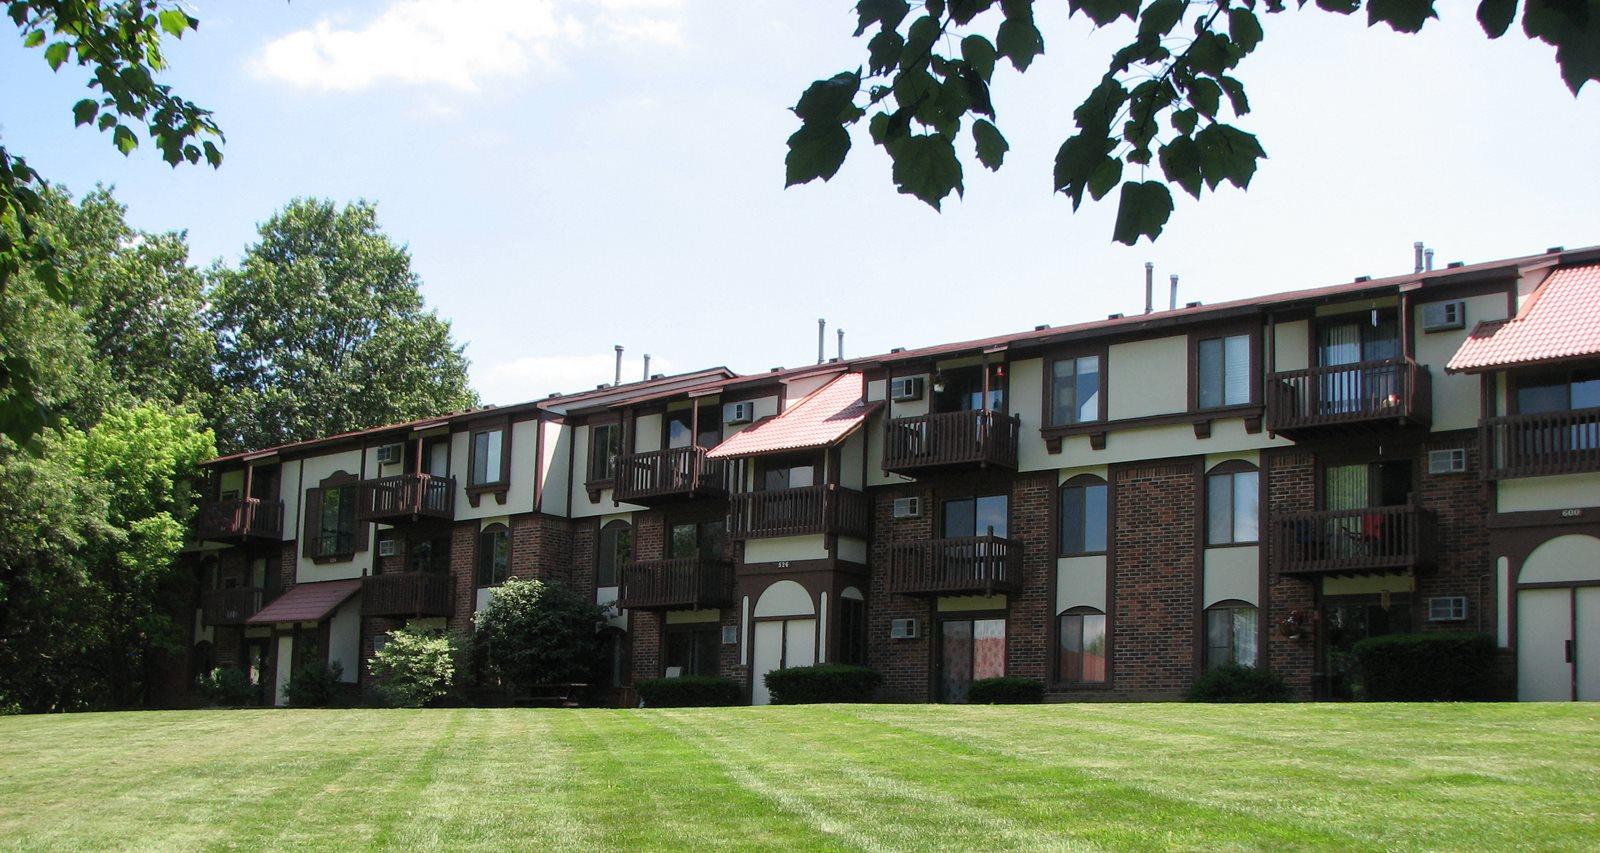 Property Entrance at Old Farm Apartments, Indiana